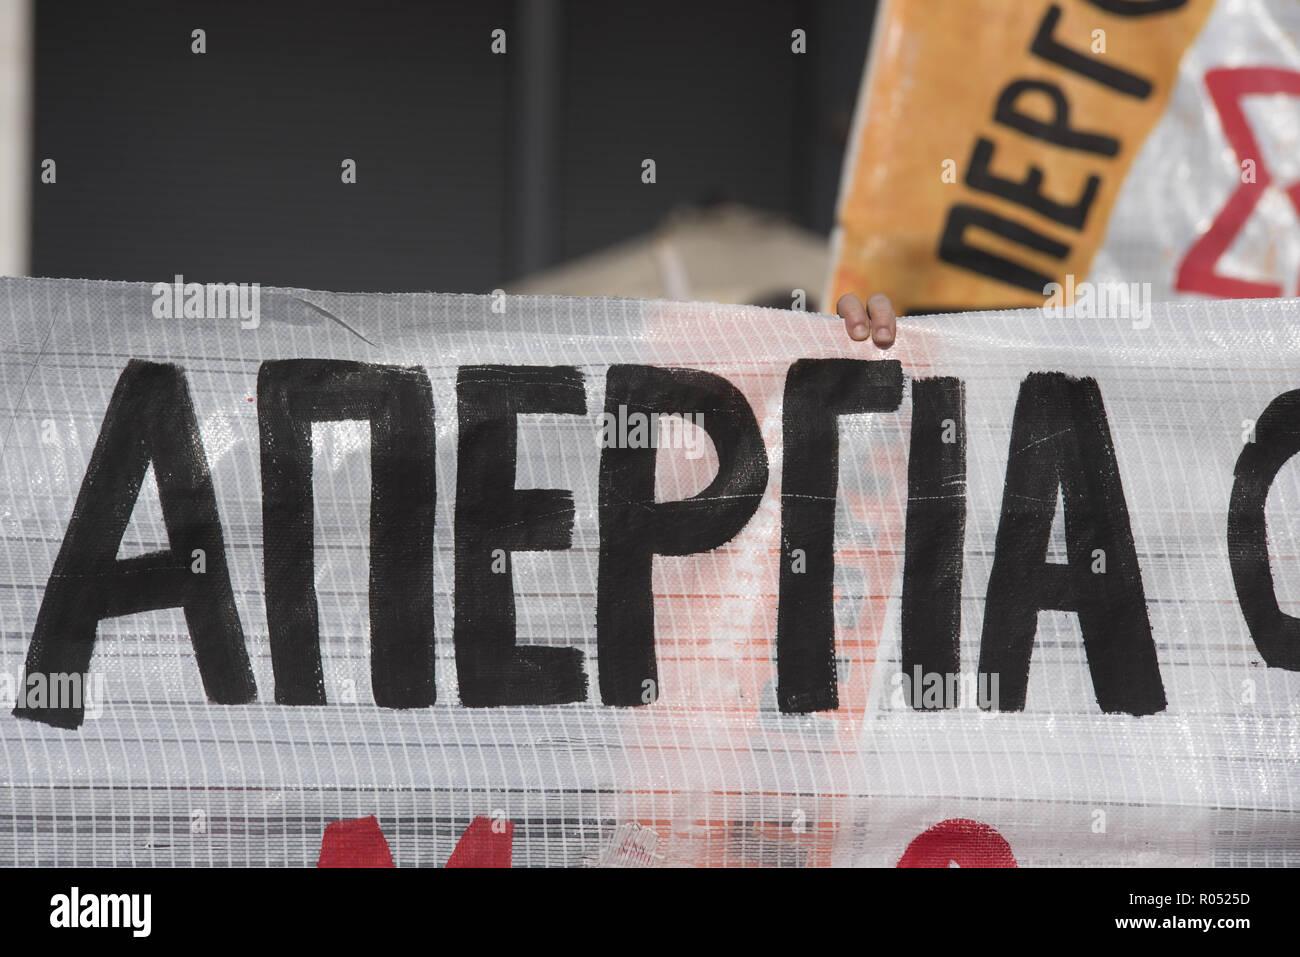 Athen Griechenland 1 Nov 2018 Protesters Shout Slogans Fordern